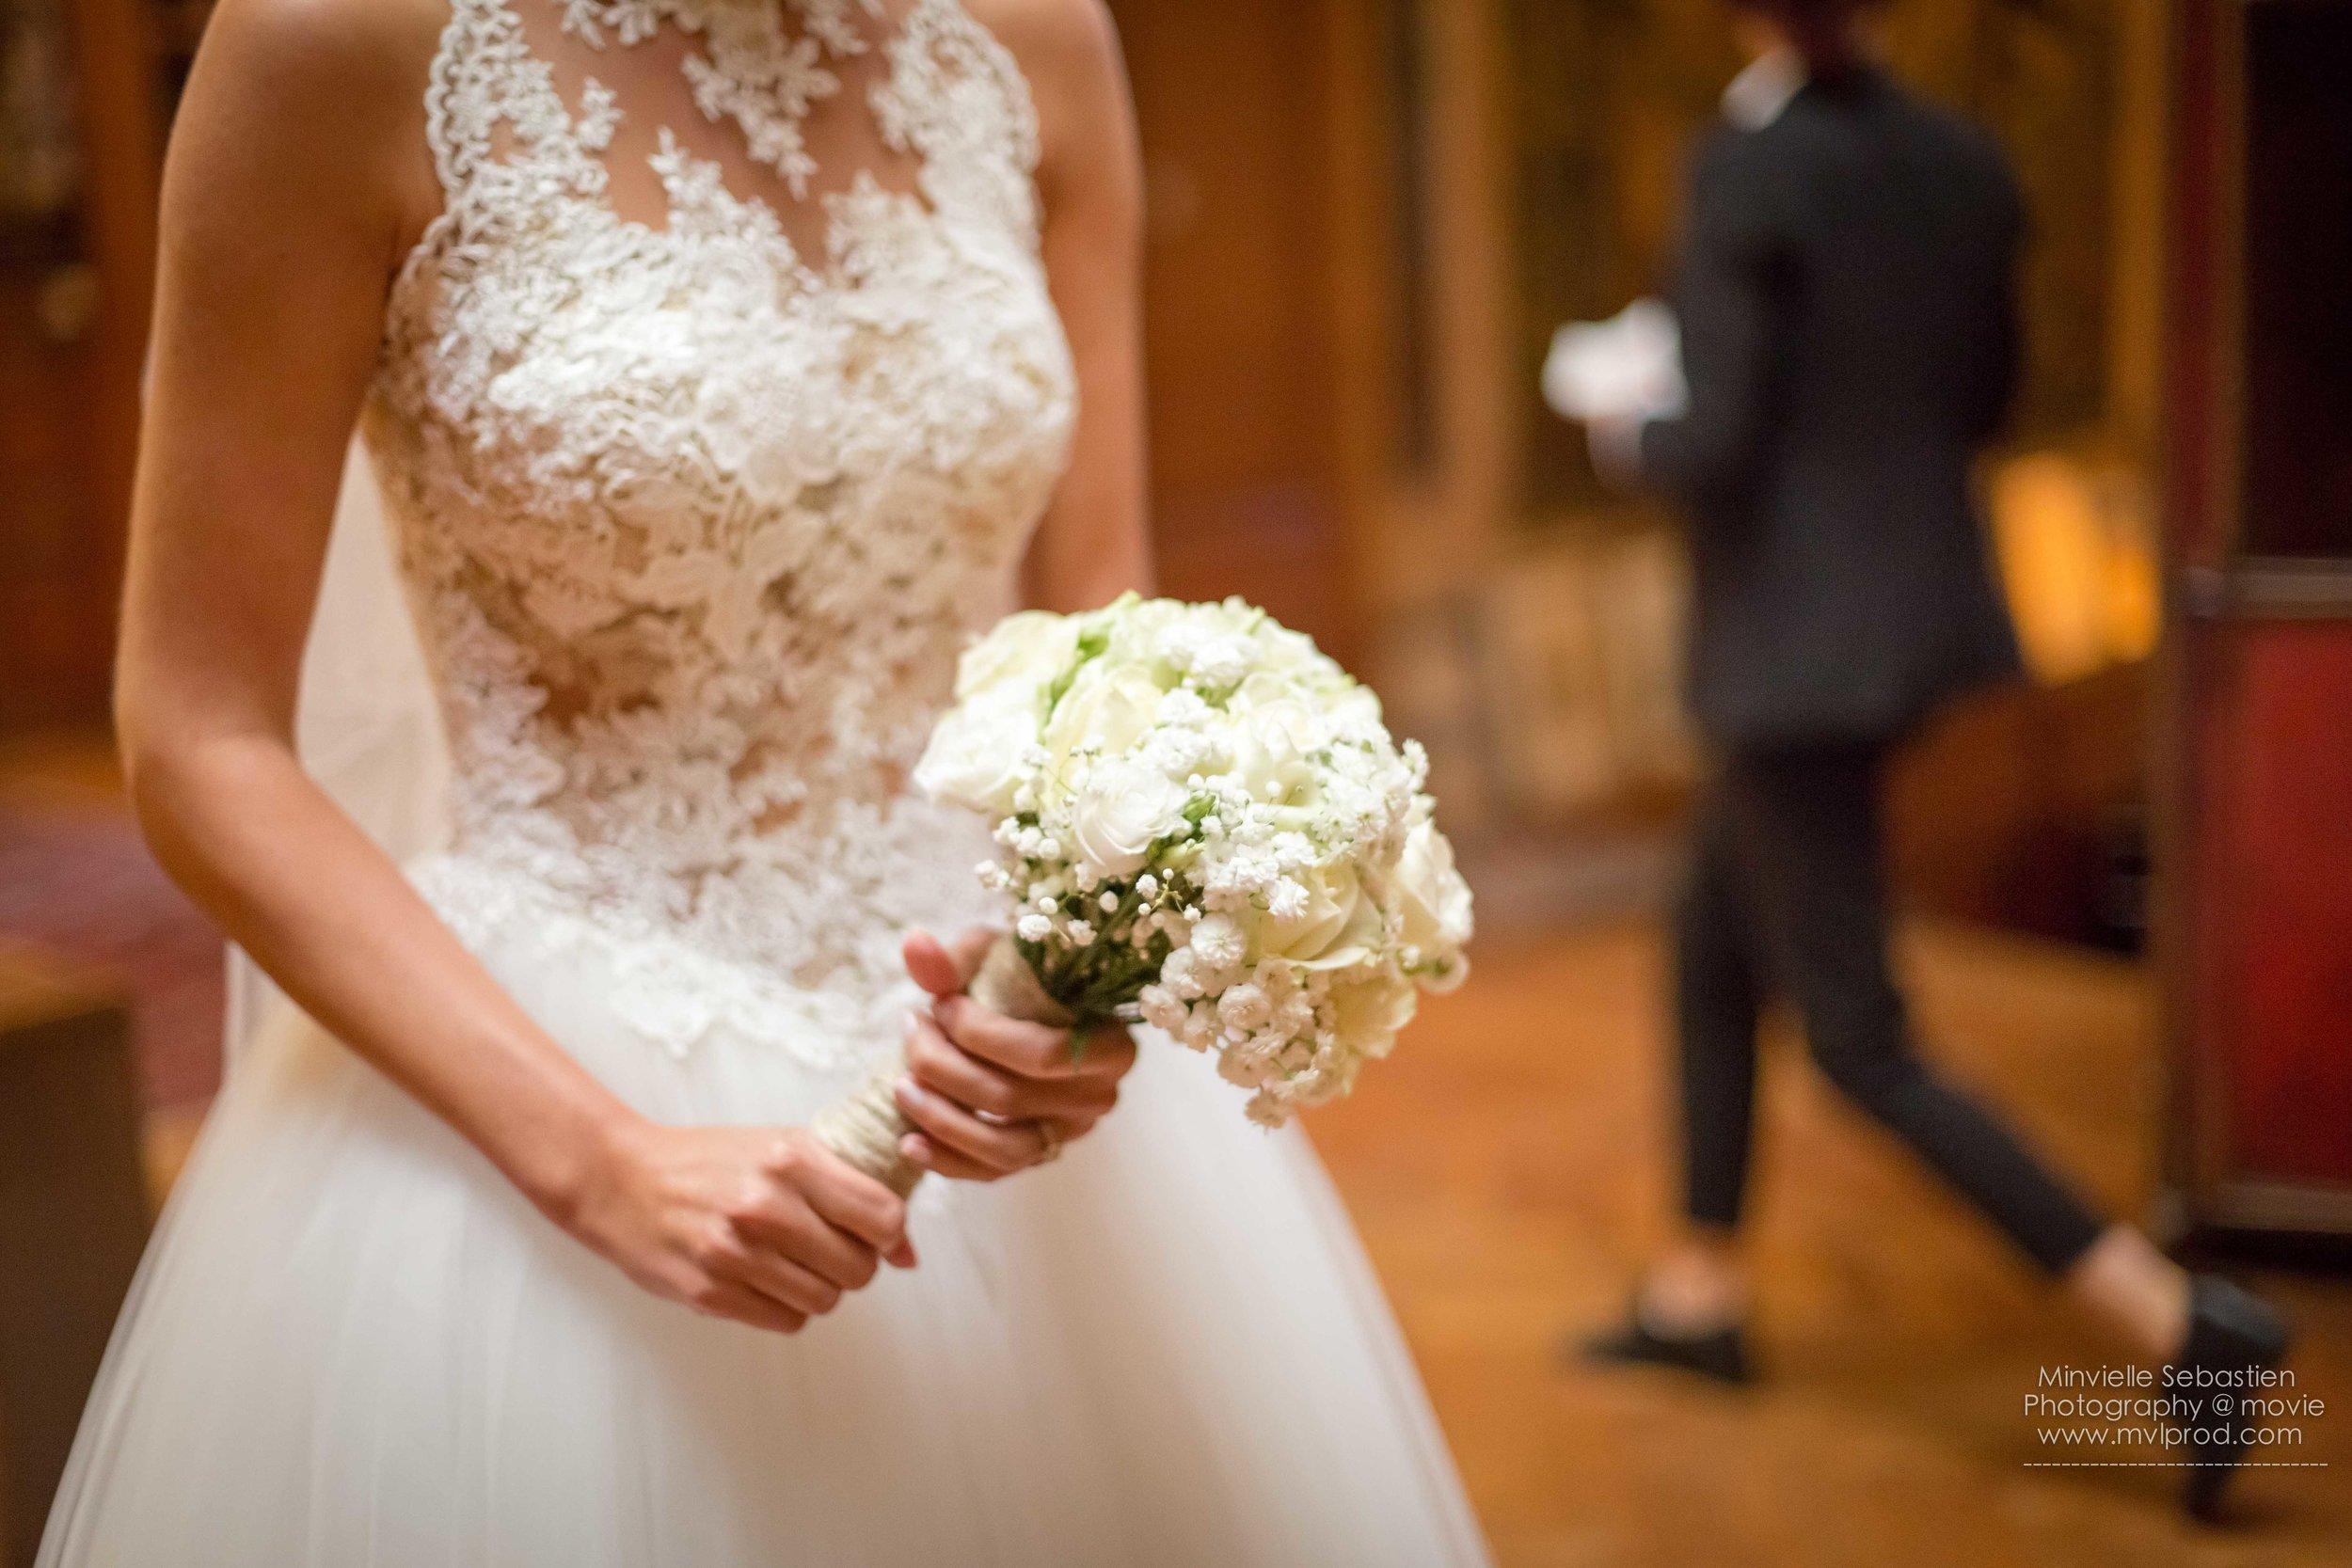 decoration-mariage-decoration-mariageIMG_1770.jpg